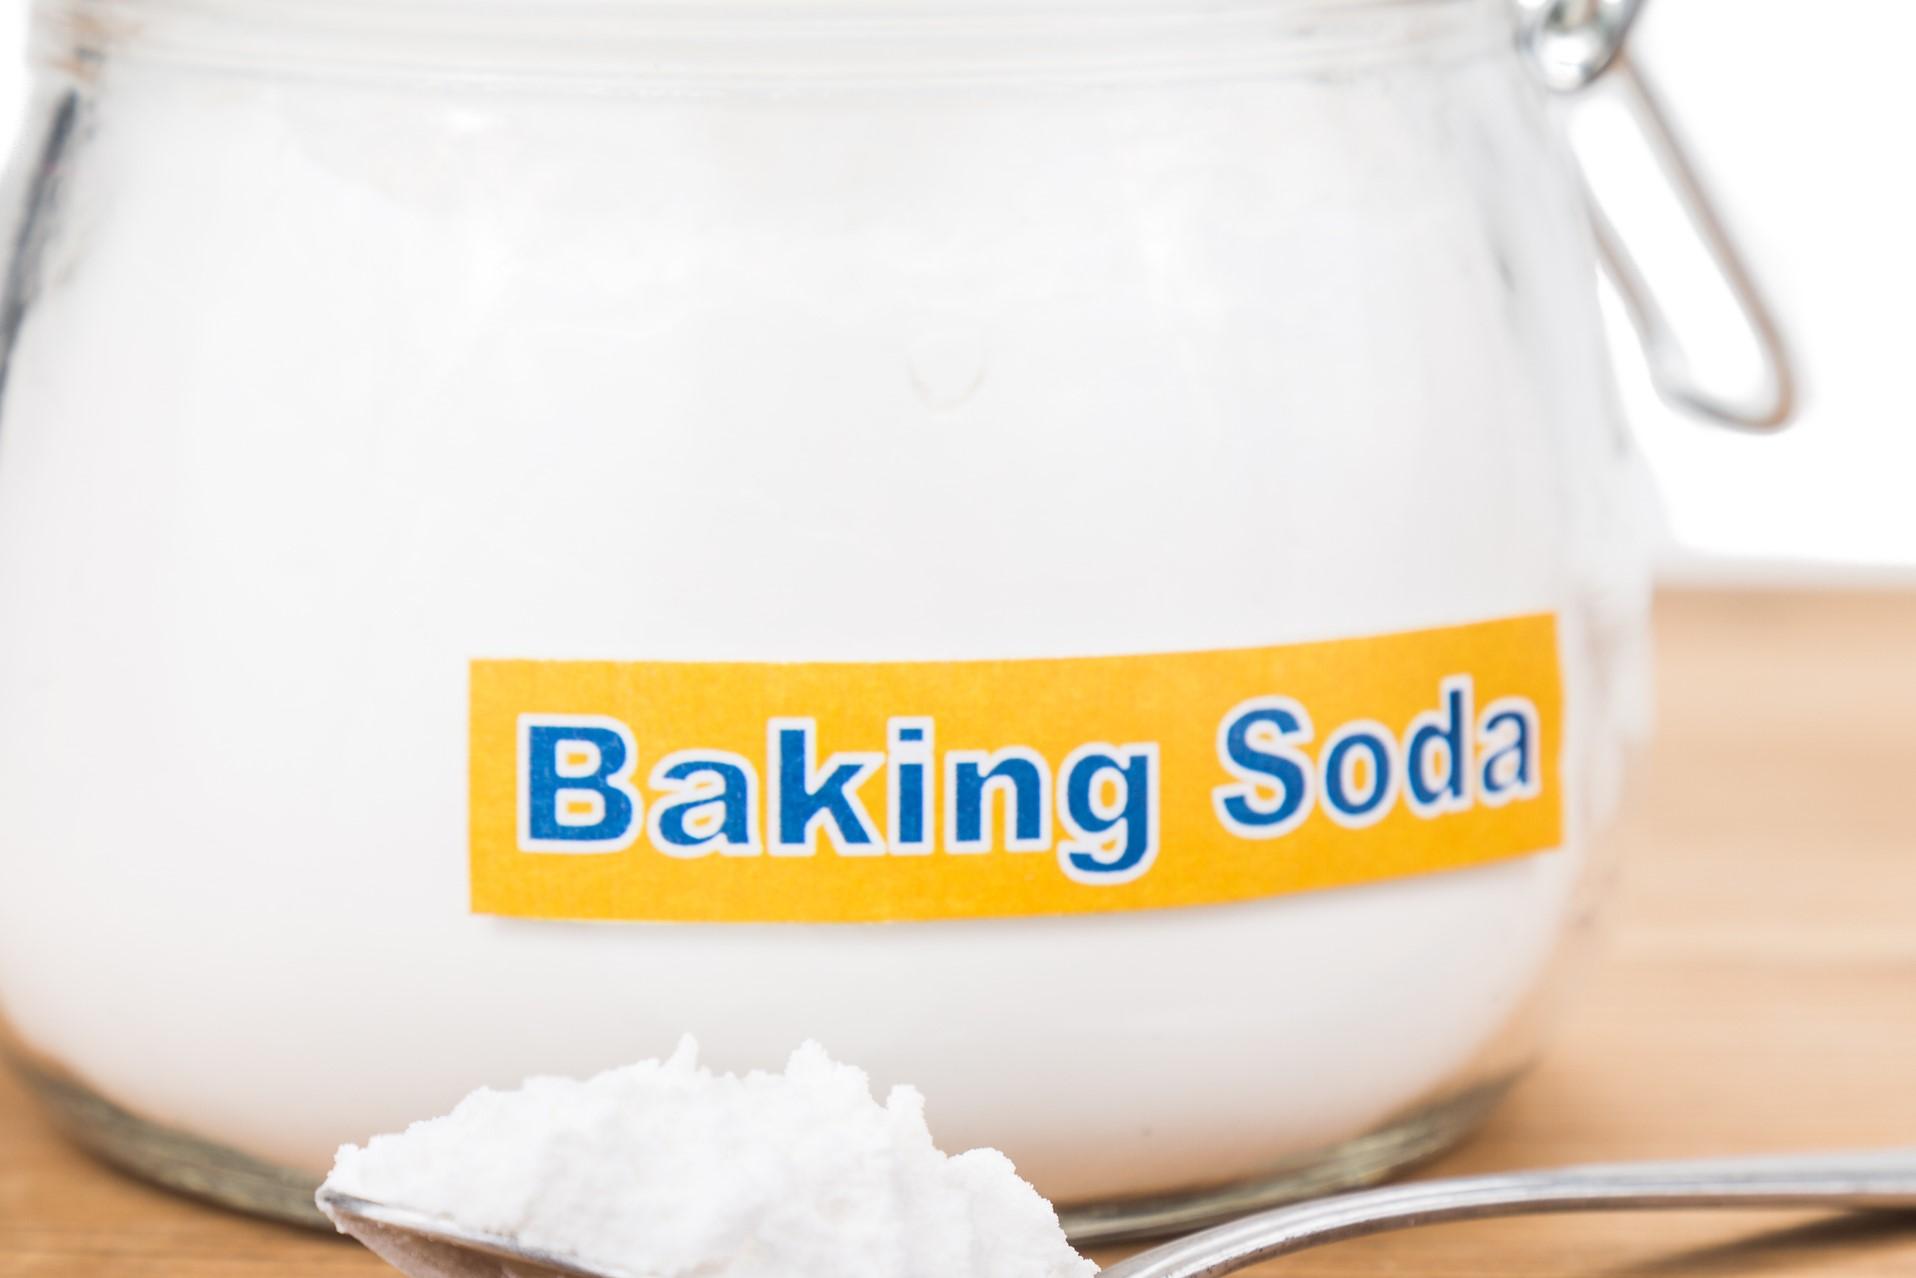 Whiten clothes with baking soda